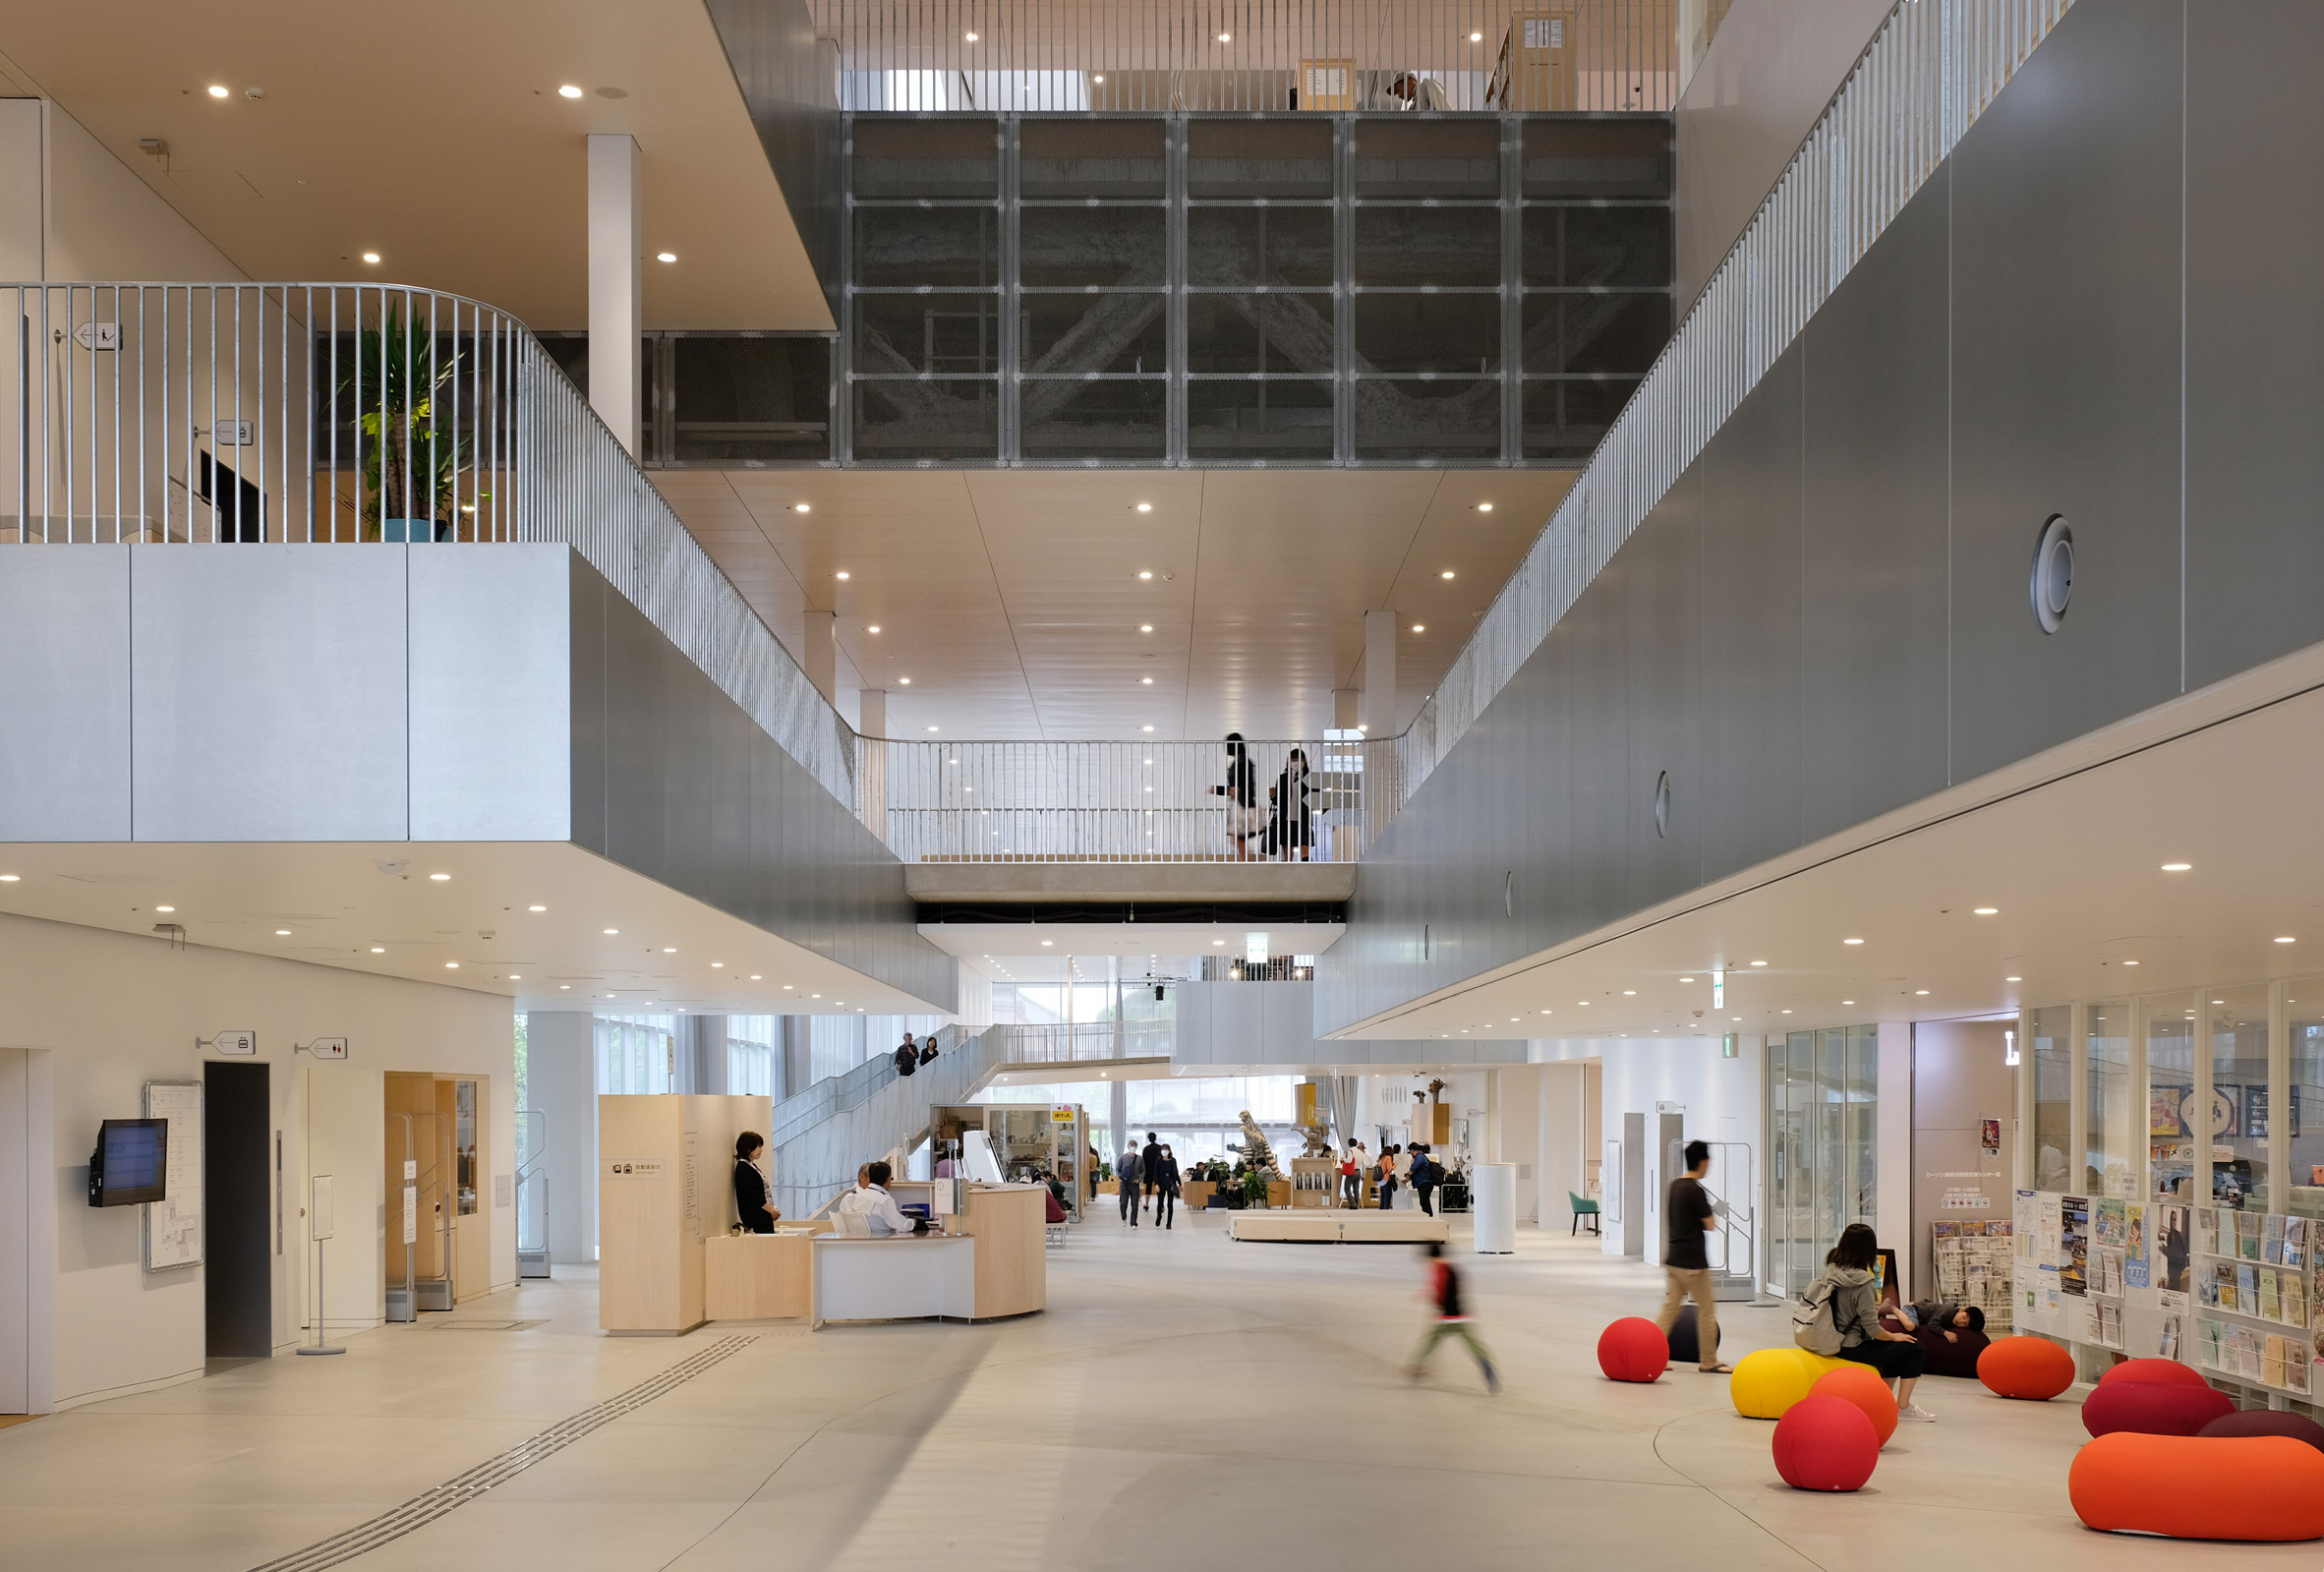 The lobby of The Sukagawa Community Center